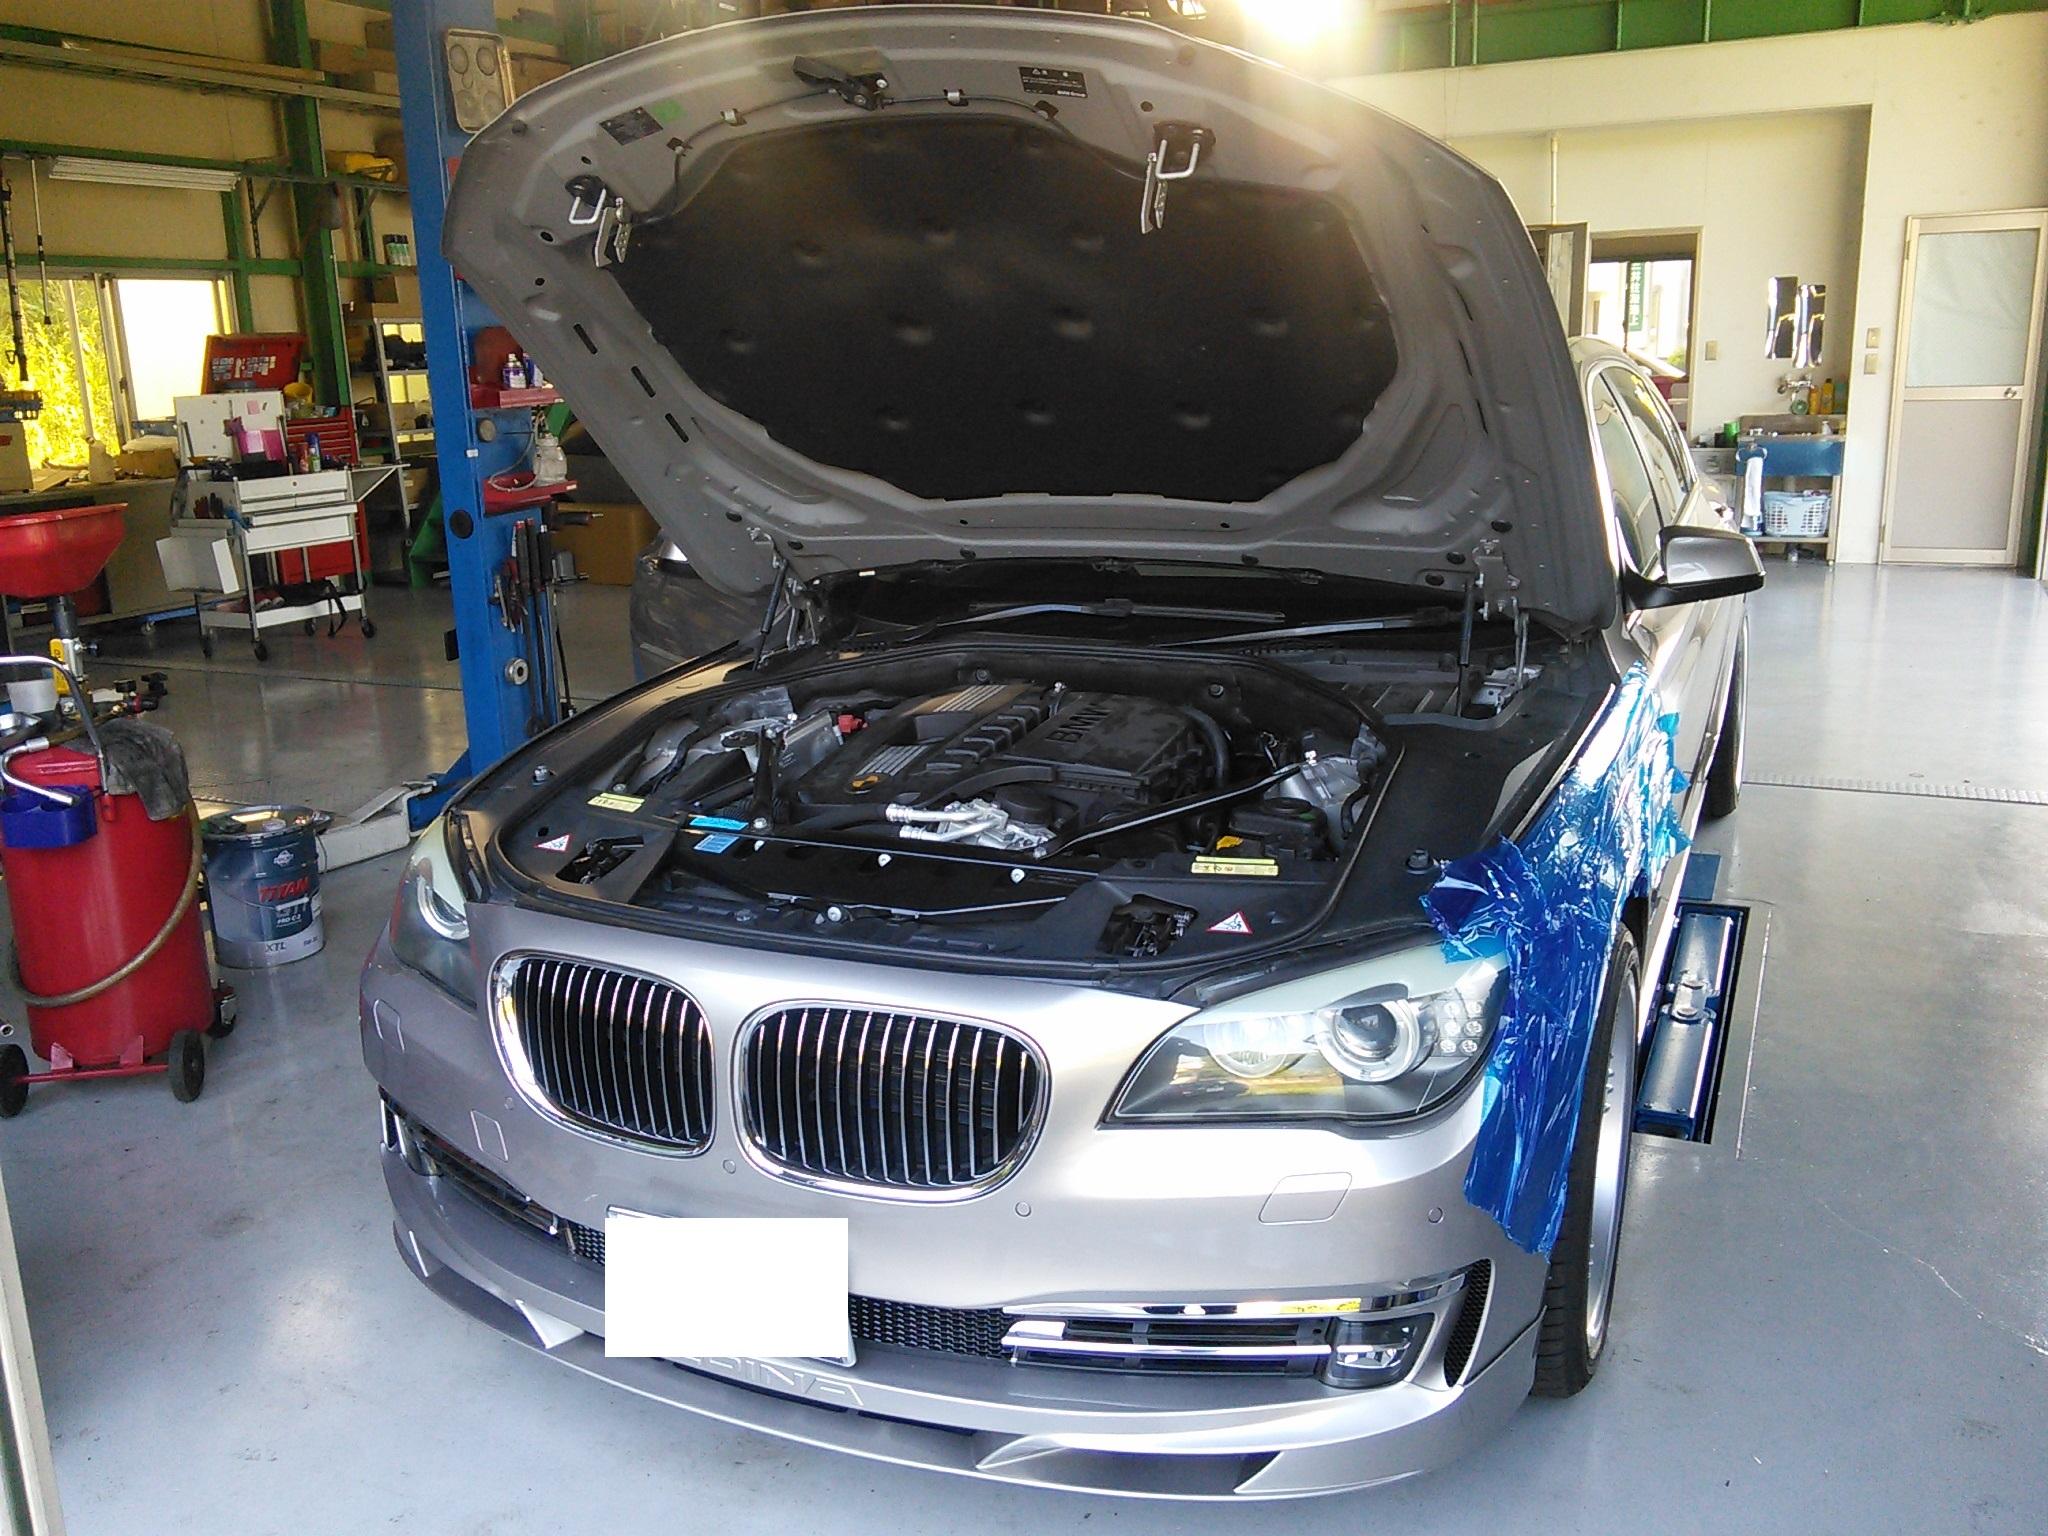 BMW 740 エンジン不調 高圧ポンプ交換 エアコン効かない修理 修理には診断機必須です